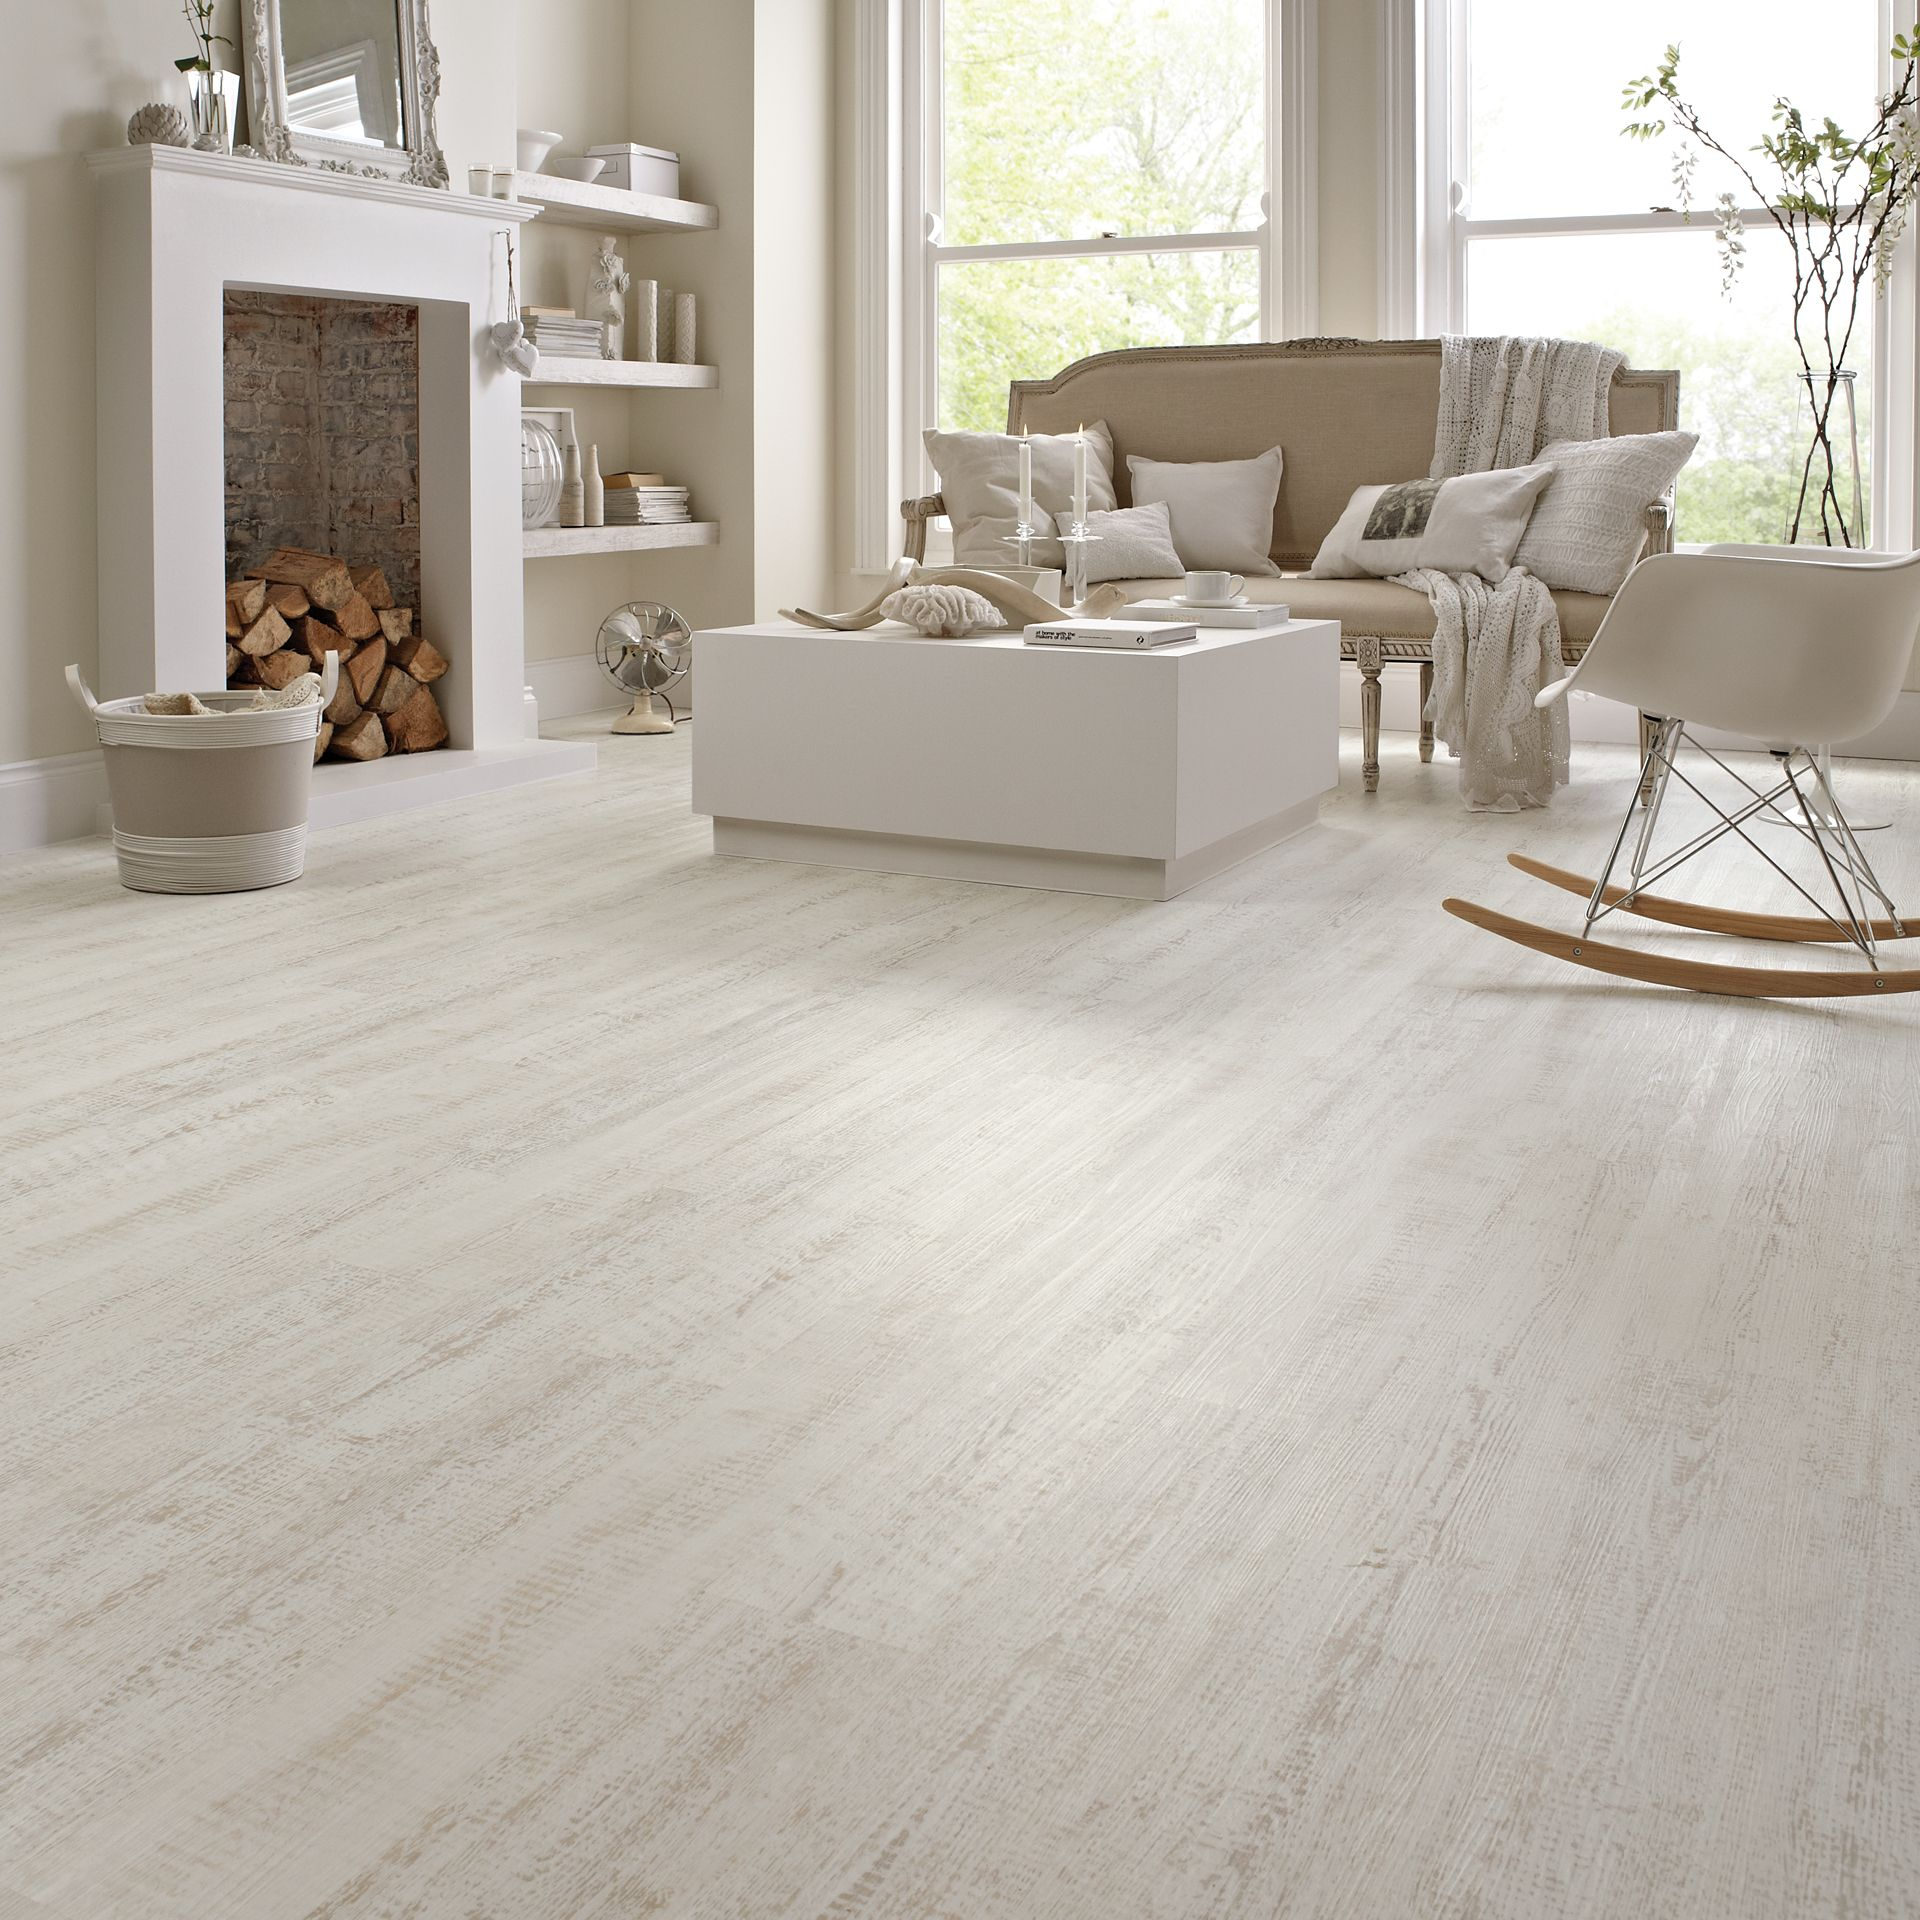 Karndean natural wood effect vinyl flooring knight tile collection karndean natural wood effect vinyl flooring knight tile collection white painted pine dailygadgetfo Images